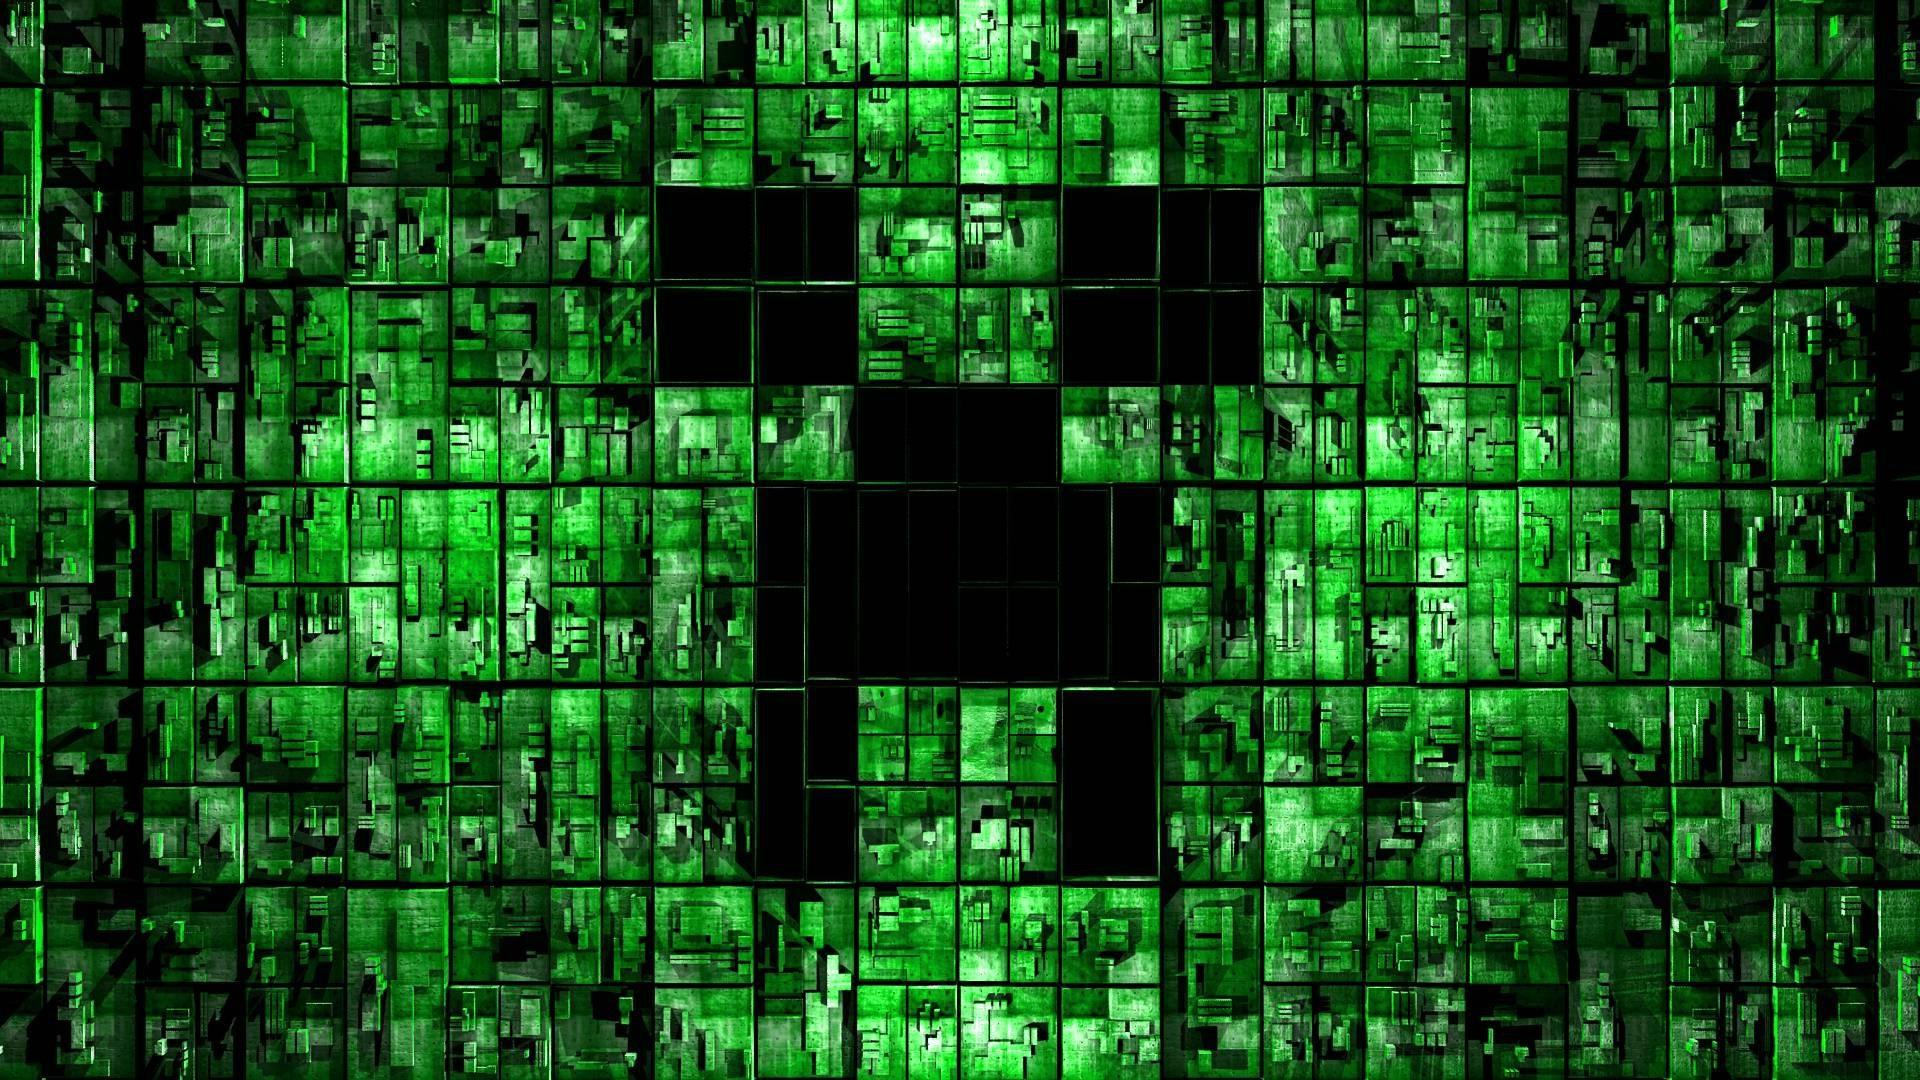 Wallpaper : digital art, 3D, text, symmetry, Minecraft